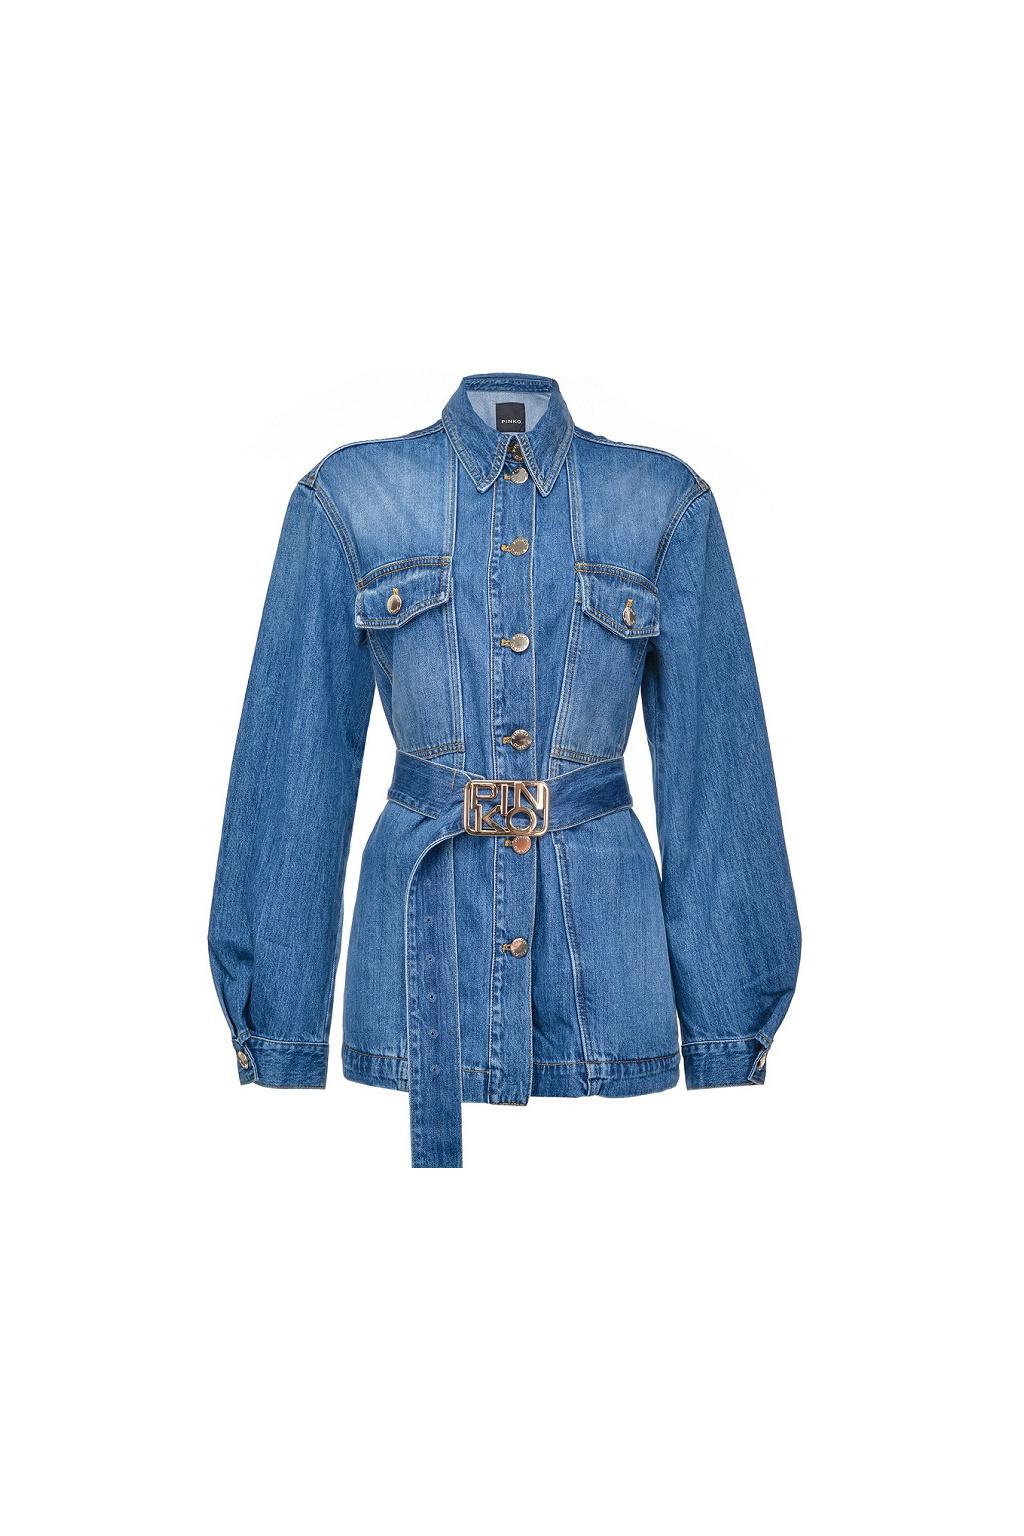 1J10HKY649 G14 Dámská džínová bunda Pinko Connie PJ297 modrá